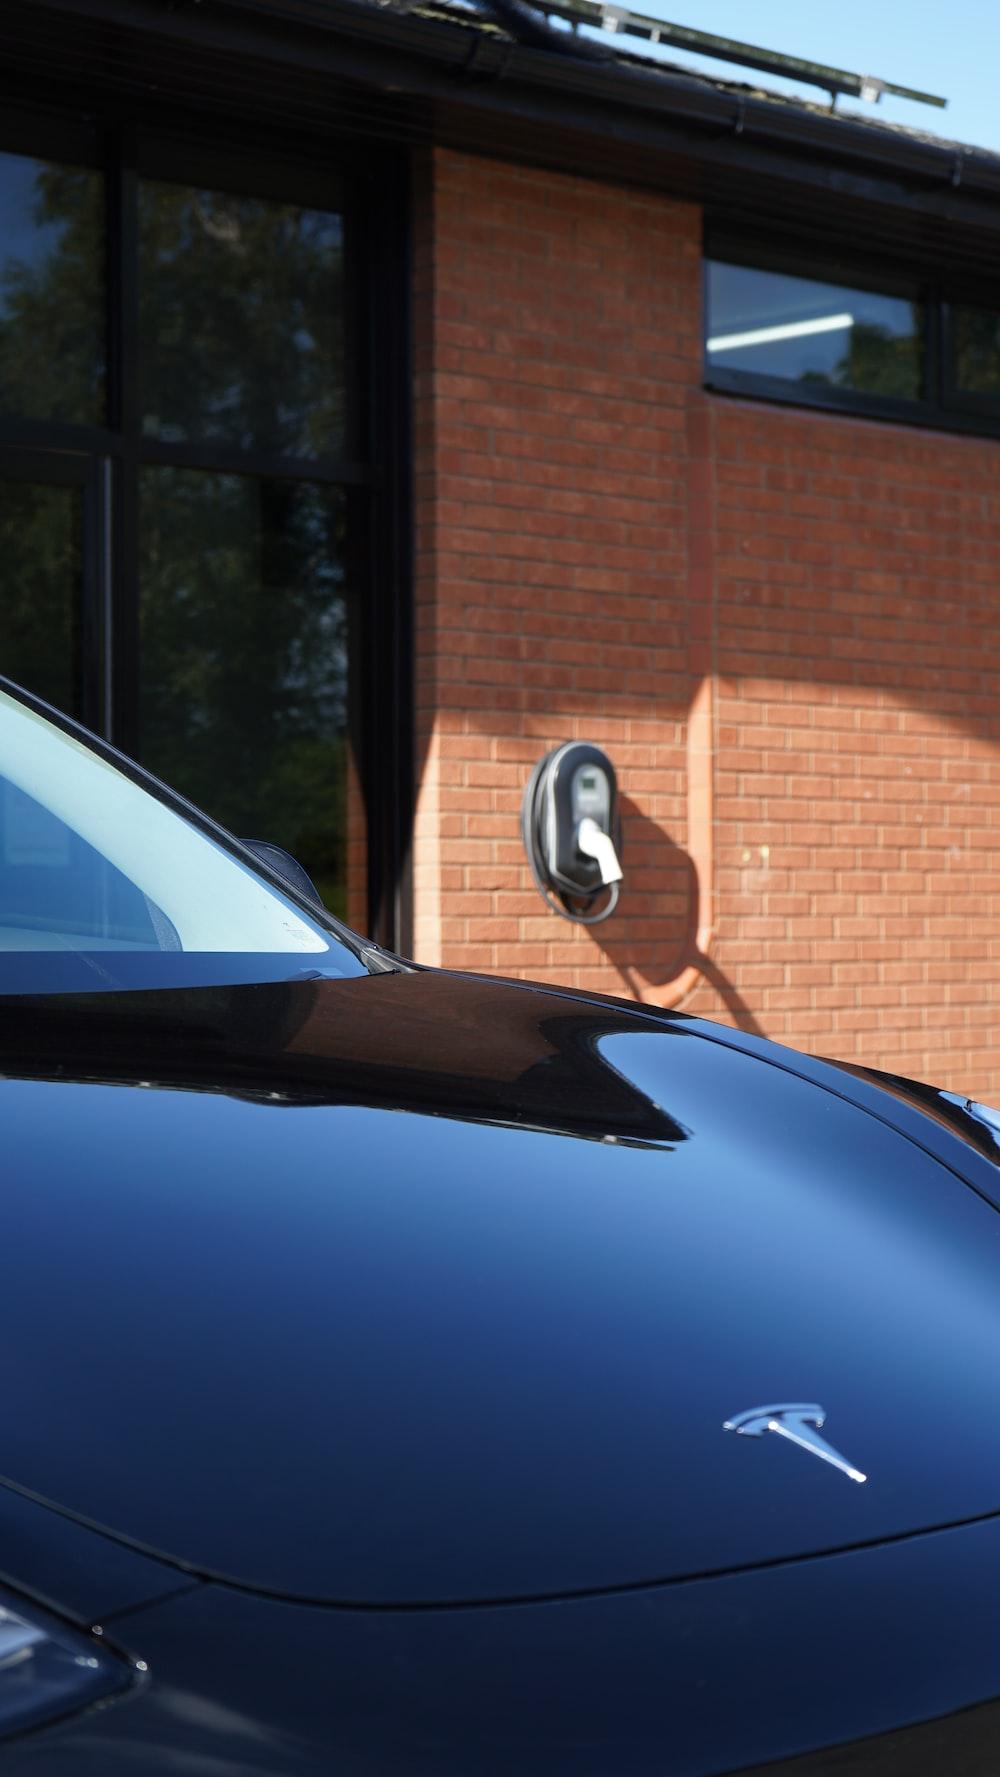 blue car parked near brown brick building